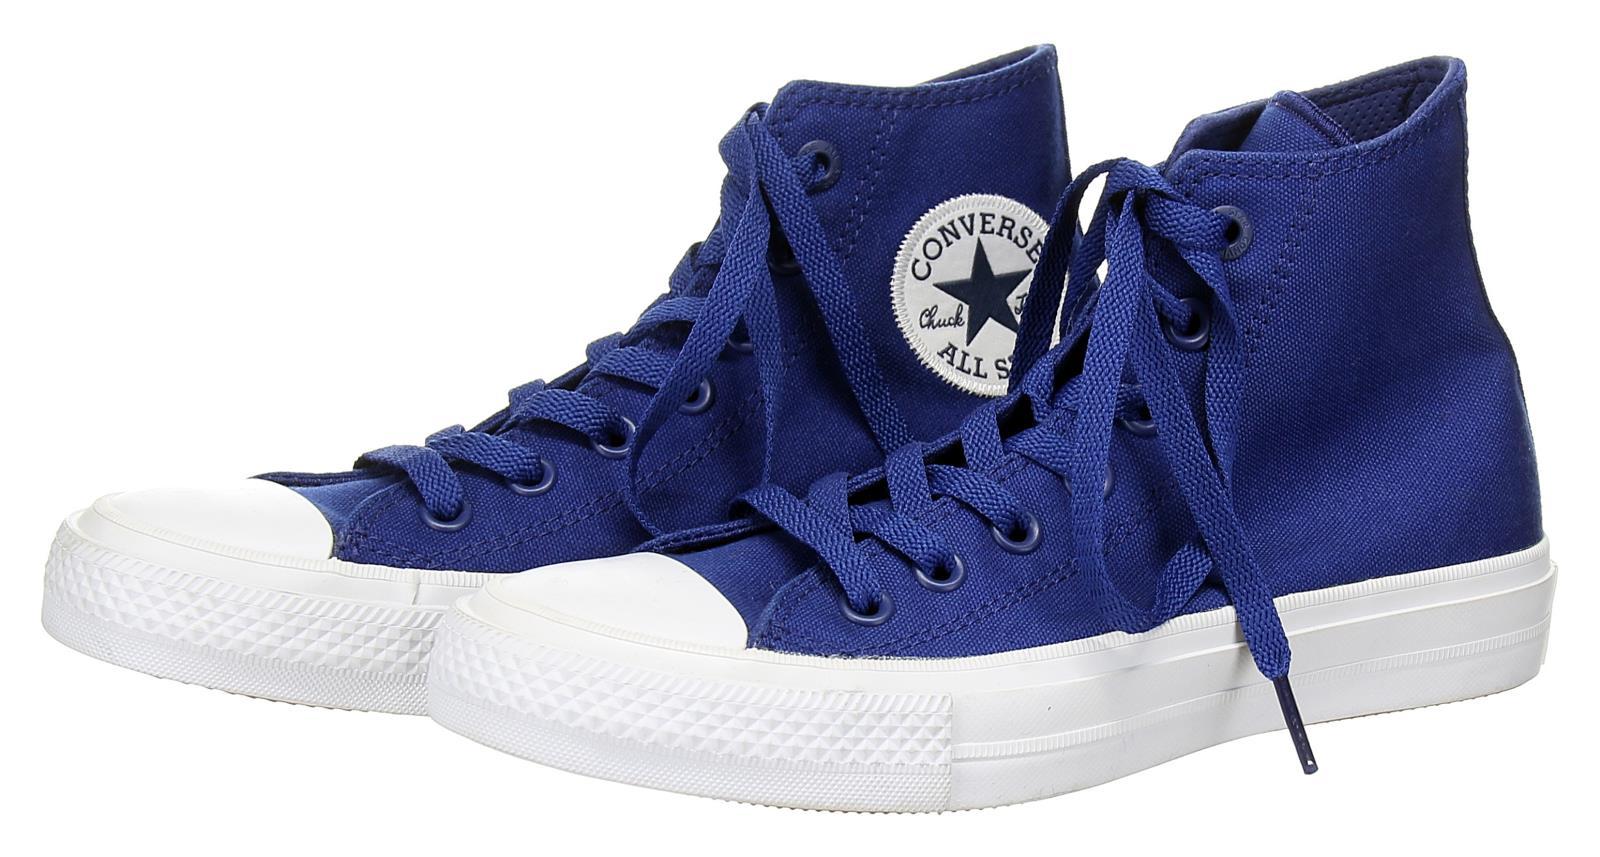 Converse Chuck Taylor II Lunarlon Blue